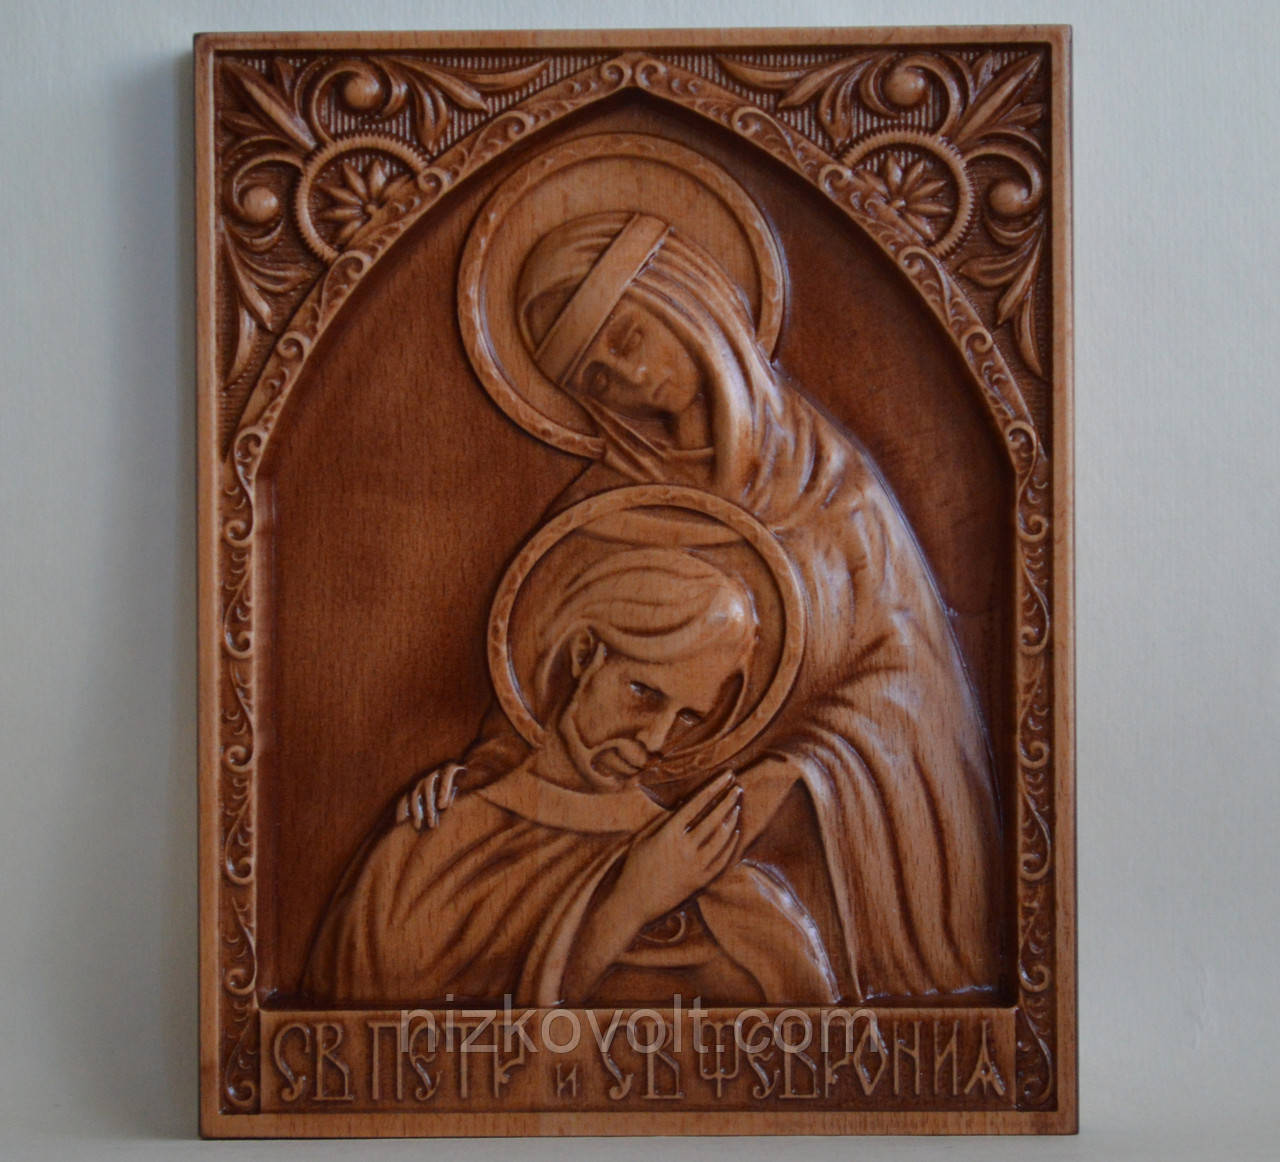 Икона Петра и Февронии - резьба на дереве (160х200х18), фото 1